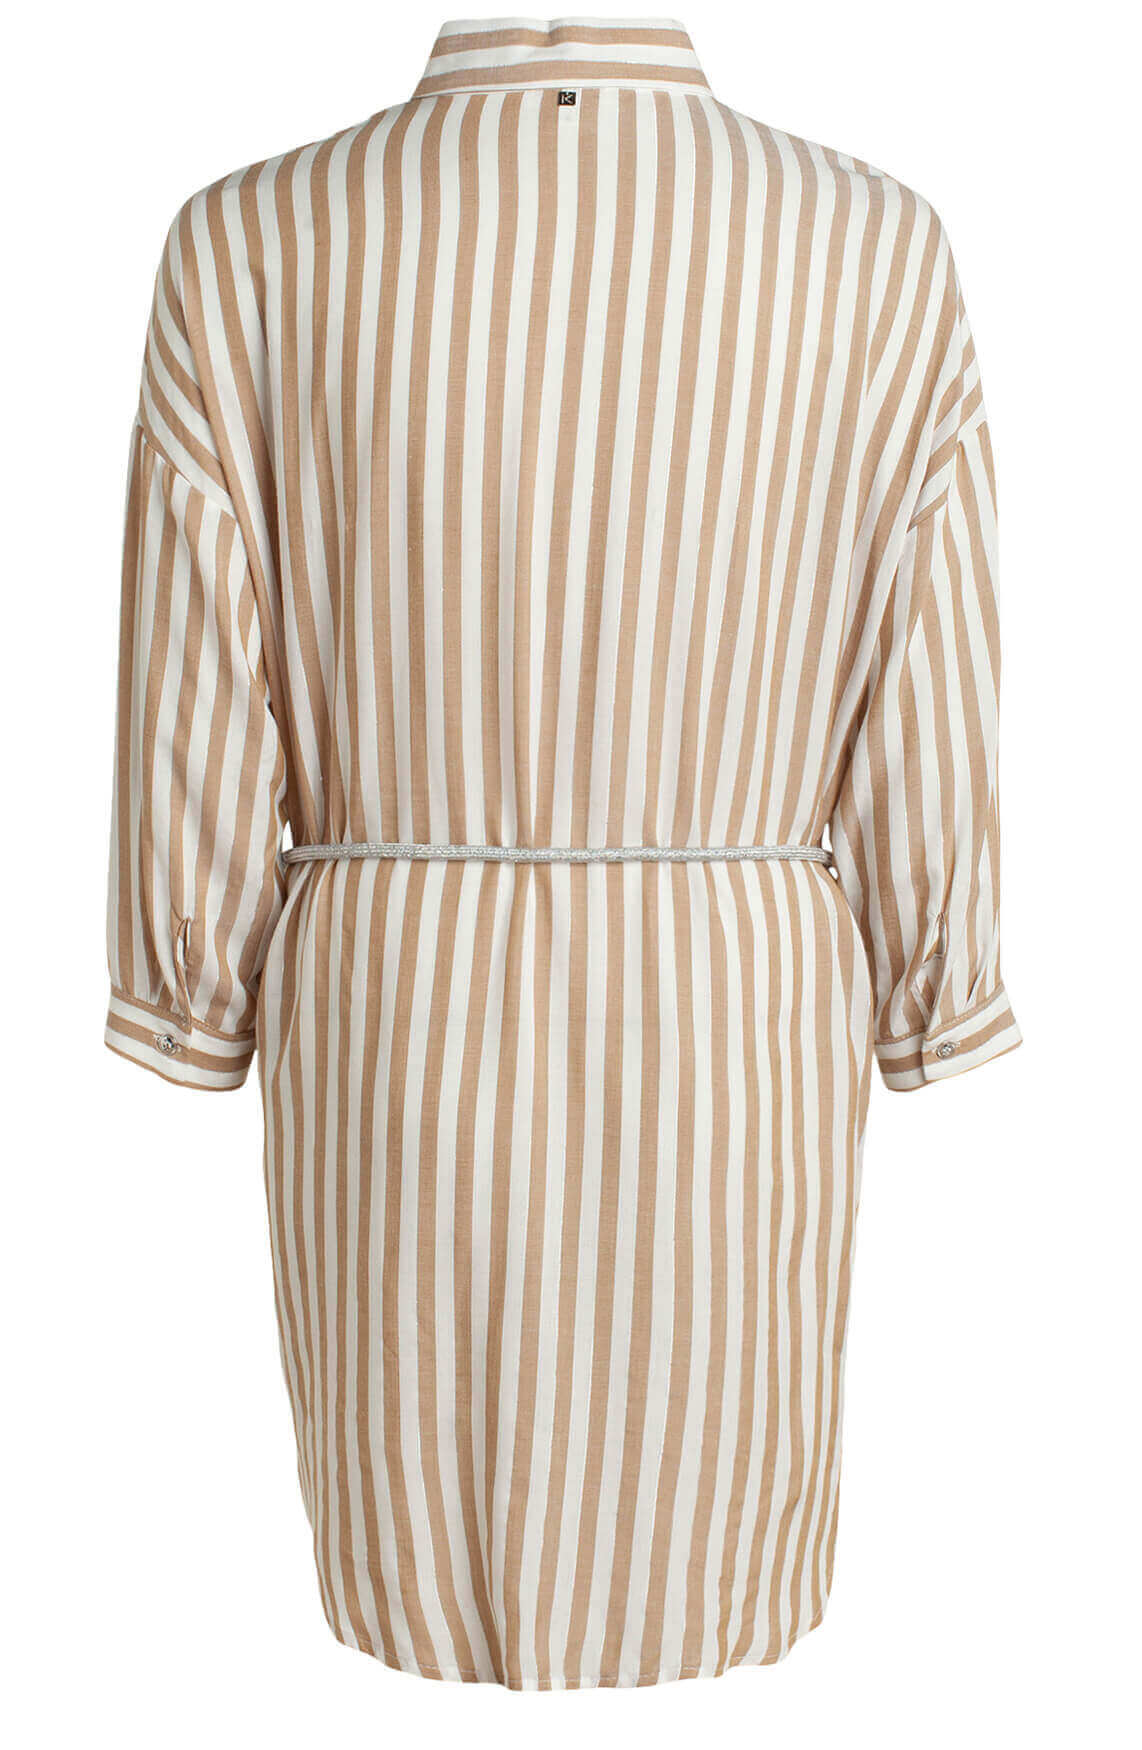 Kocca Dames Nelles lurex gestreepte blouse Bruin